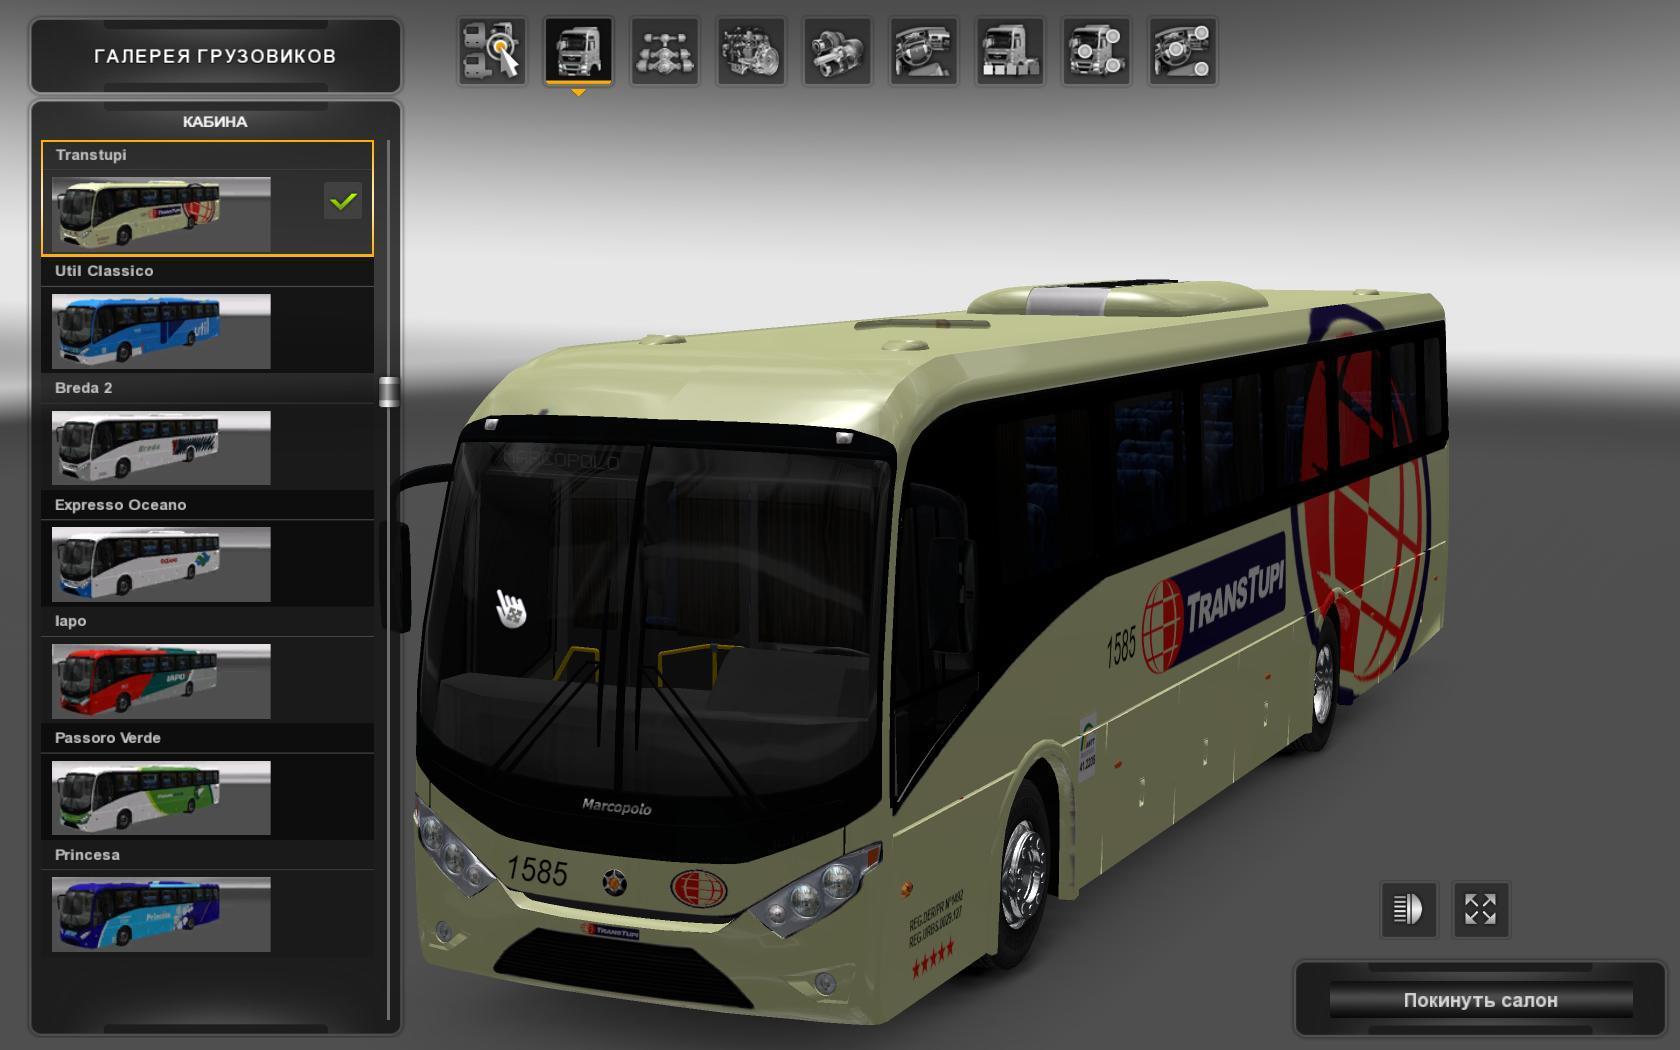 MAPA EAA BUS V1.9 For ETS2 -Euro Truck Simulator 2 Mods